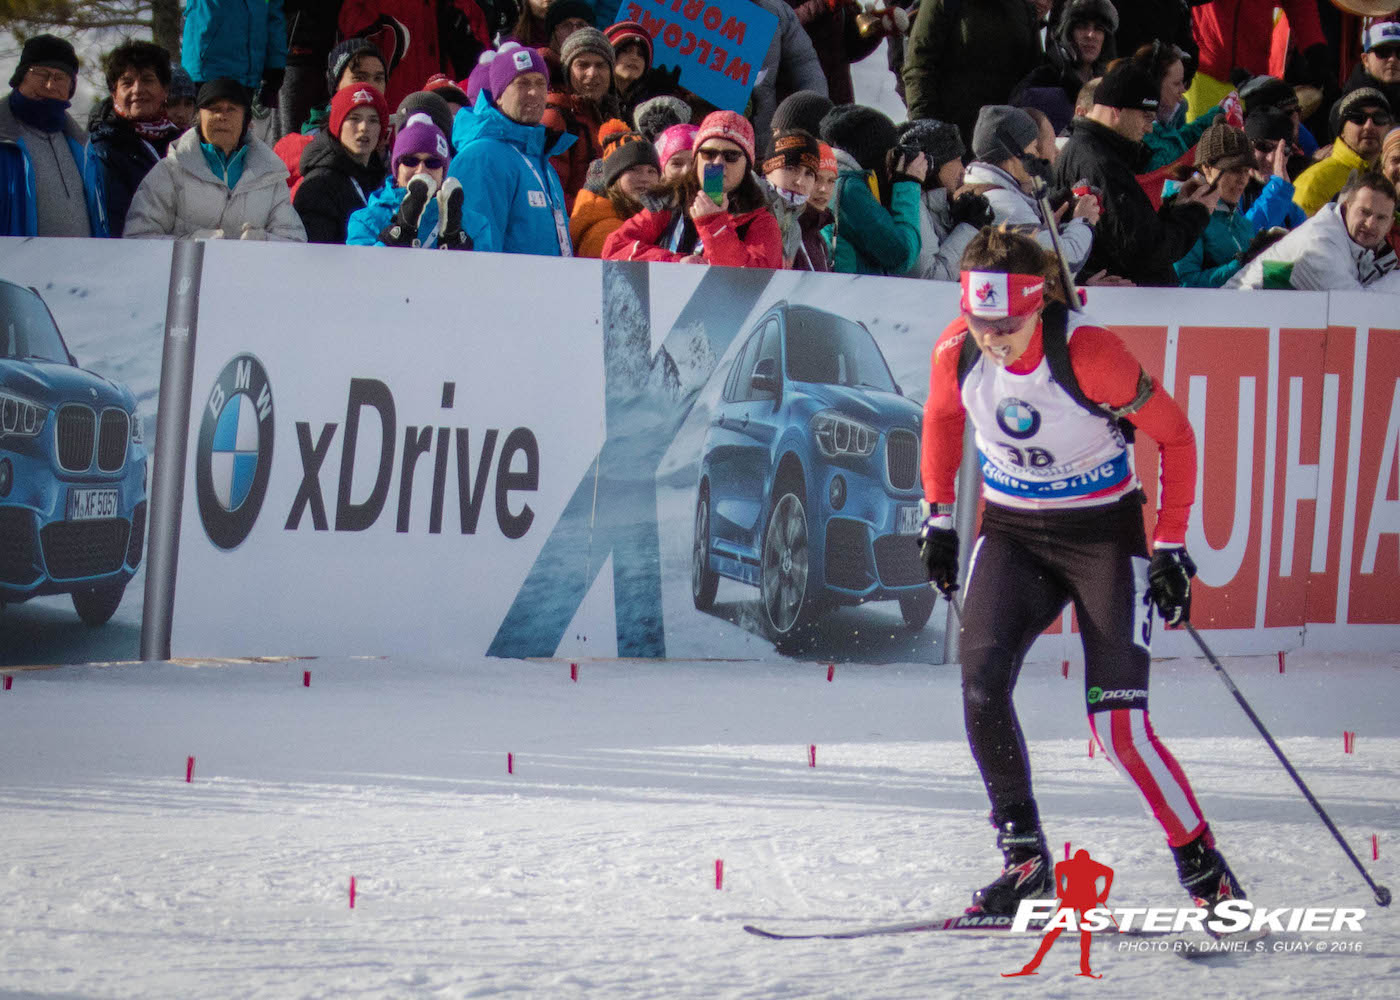 https://fasterskier.com/wp-content/blogs.dir/1/files/2016/02/BMW-IBU-WC7-Women-7.5km-Sprint-23.jpg